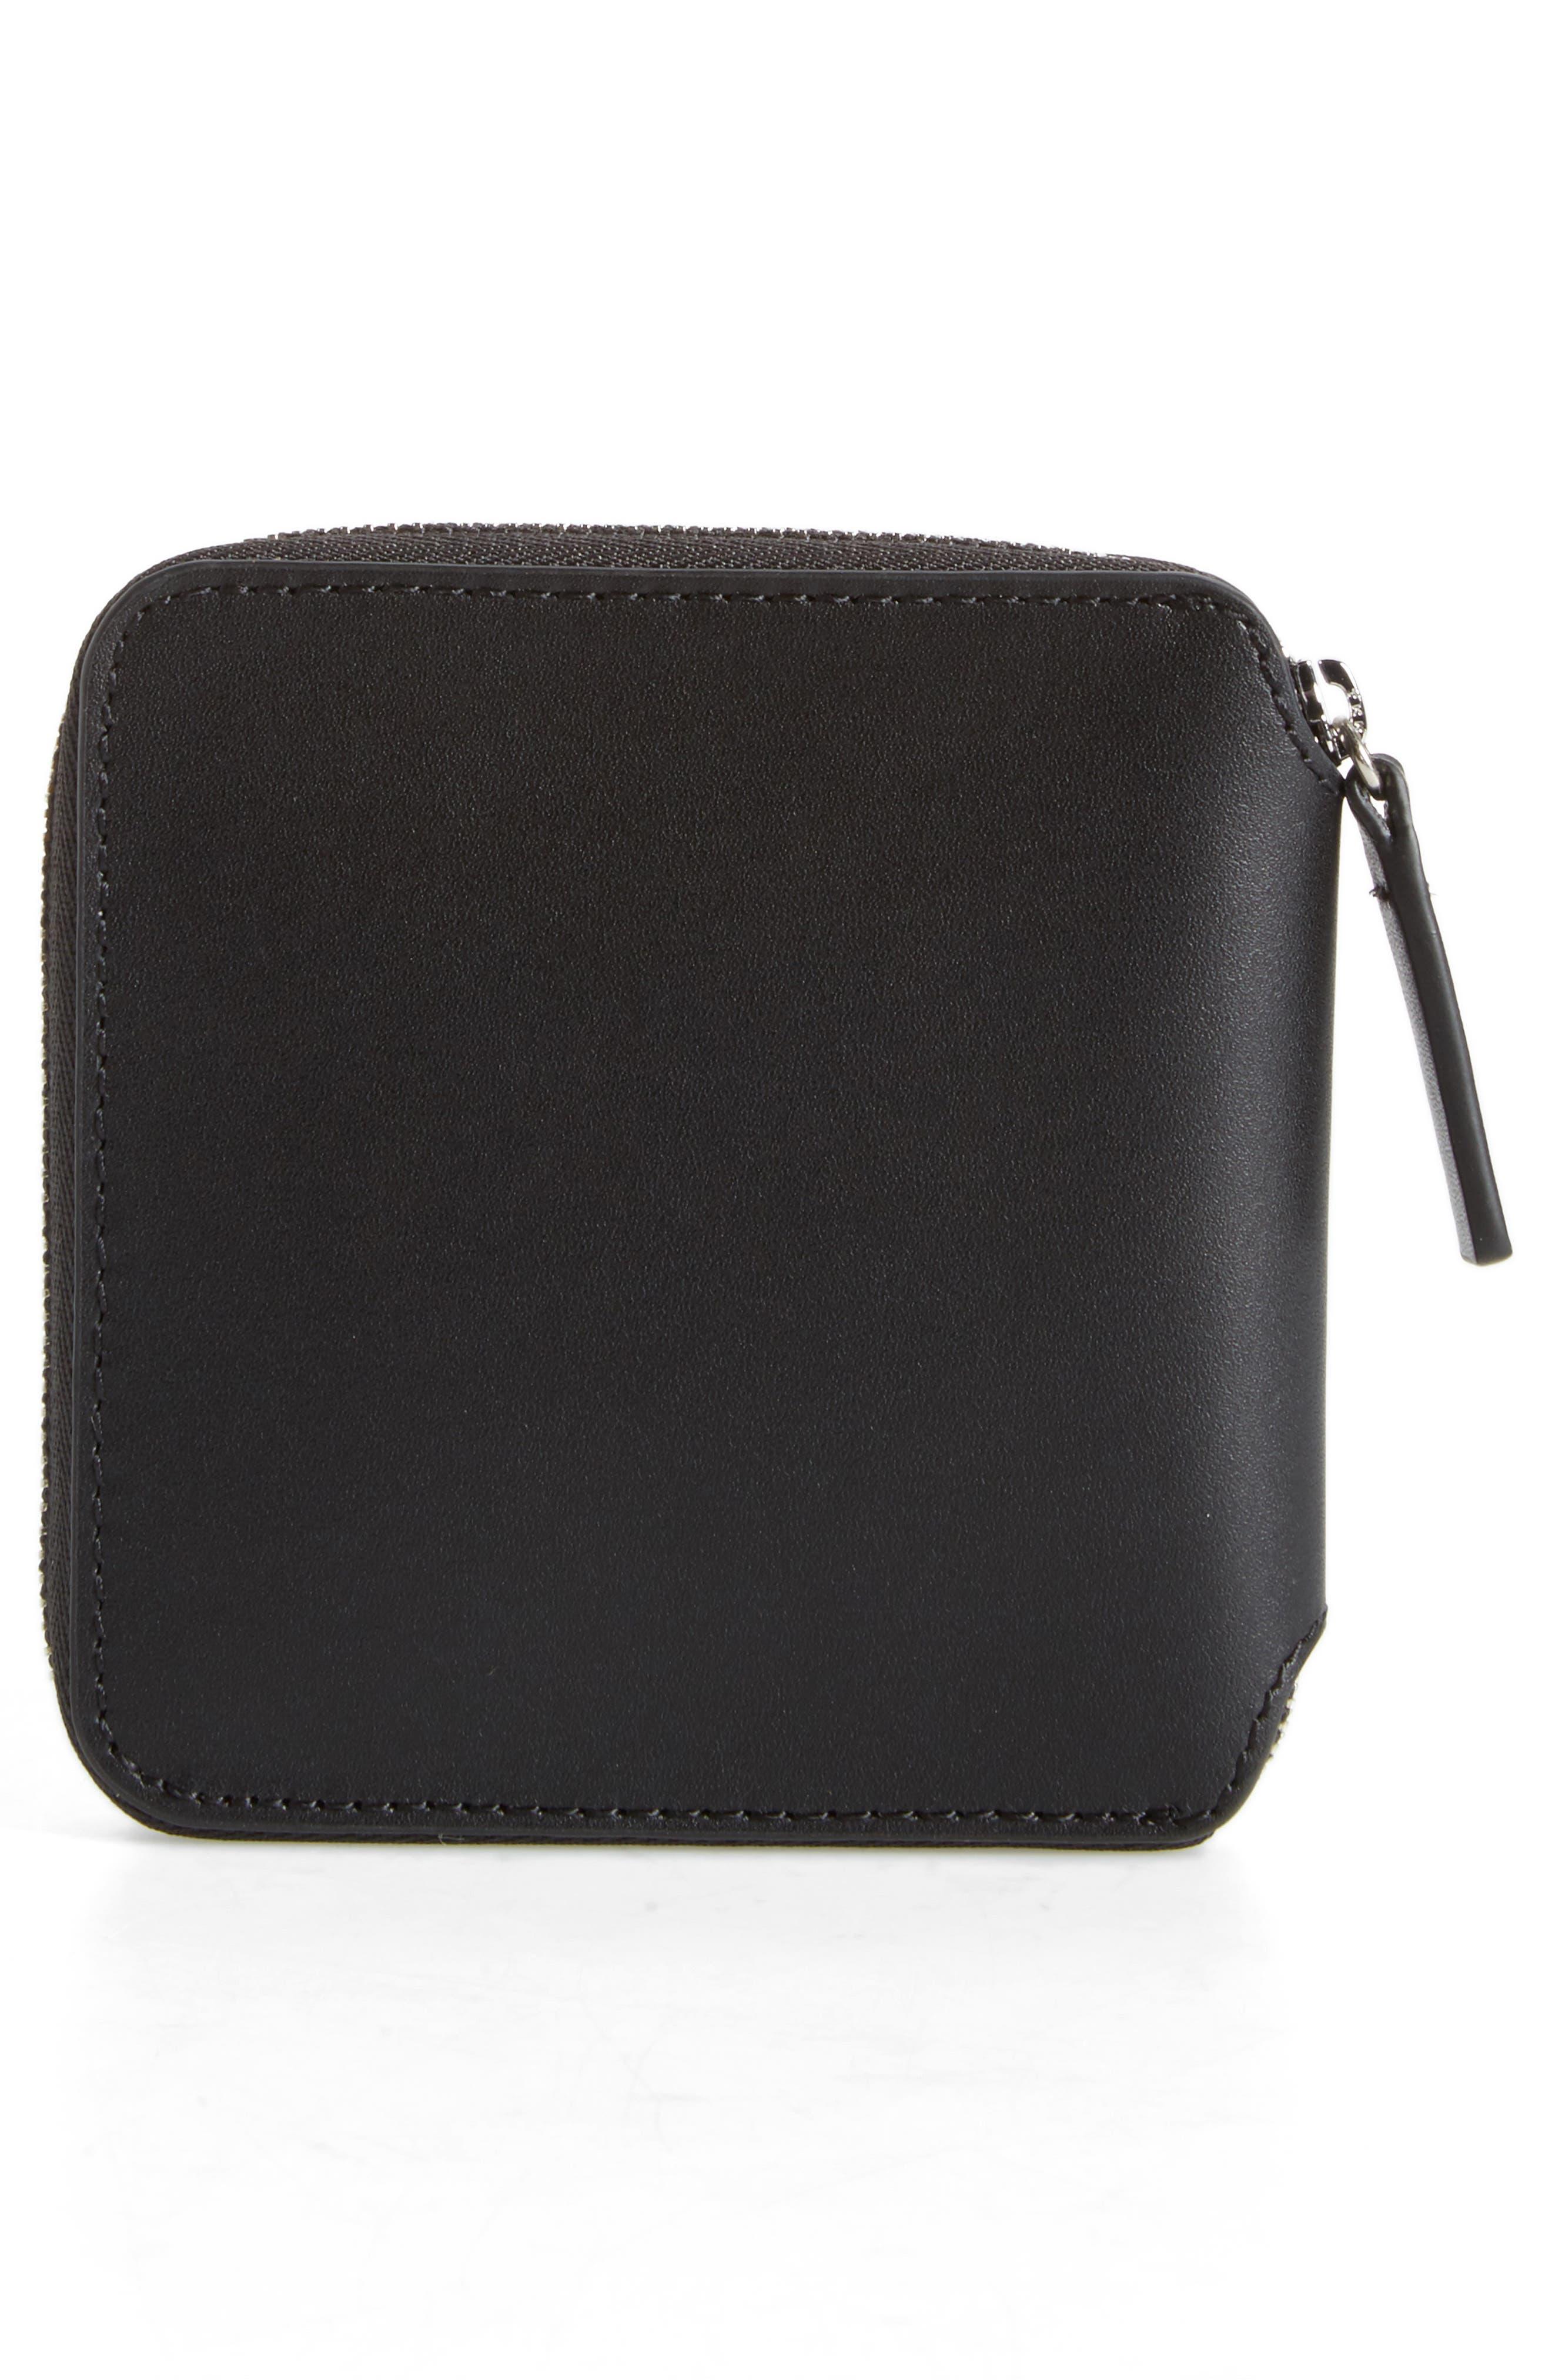 BAGGU,                             Zip Around Square Leather Wallet,                             Alternate thumbnail 4, color,                             001